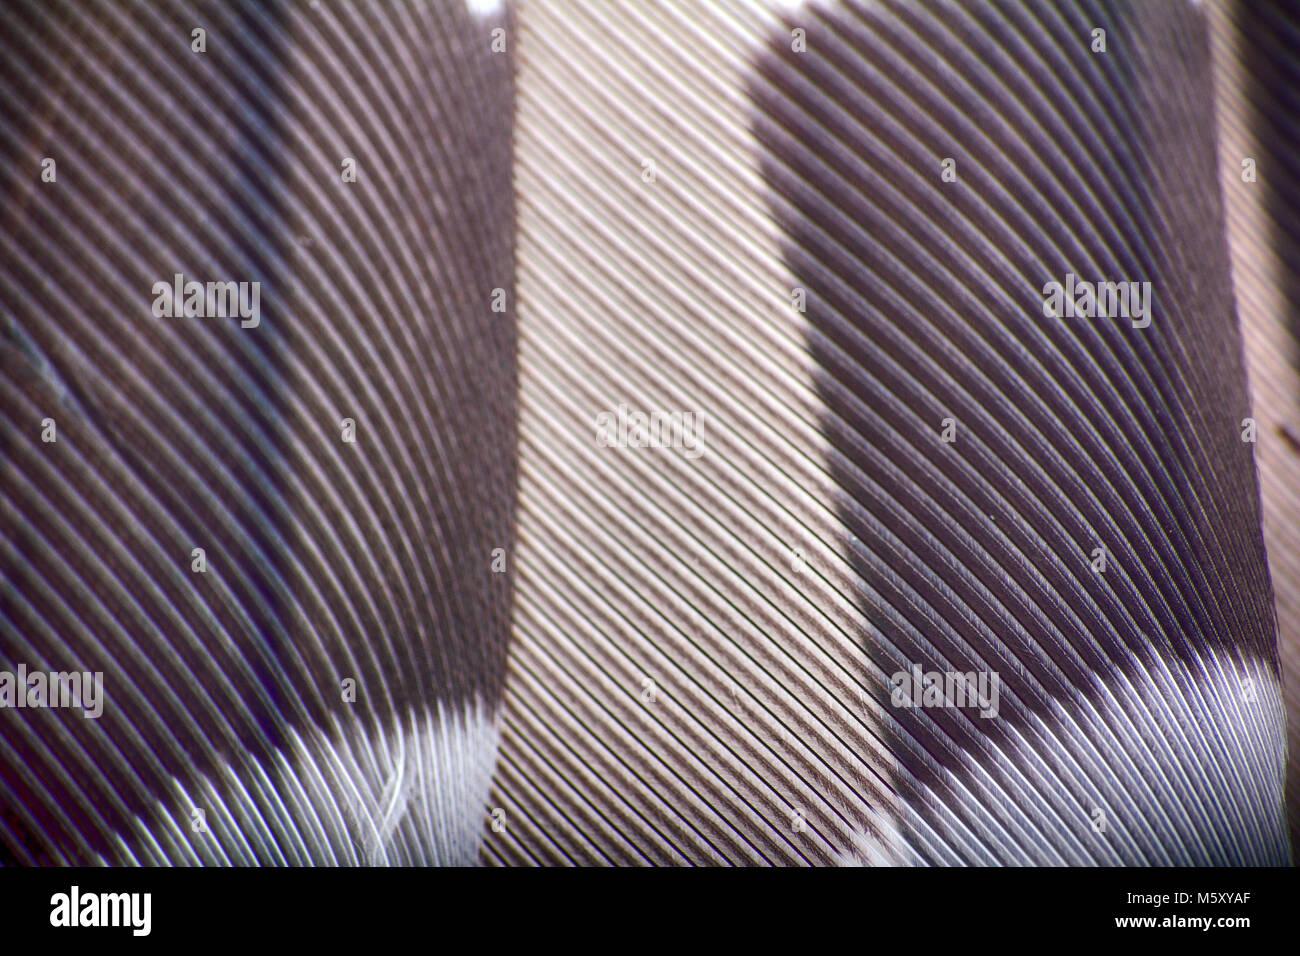 Grosgrain immagini & grosgrain fotos stock alamy